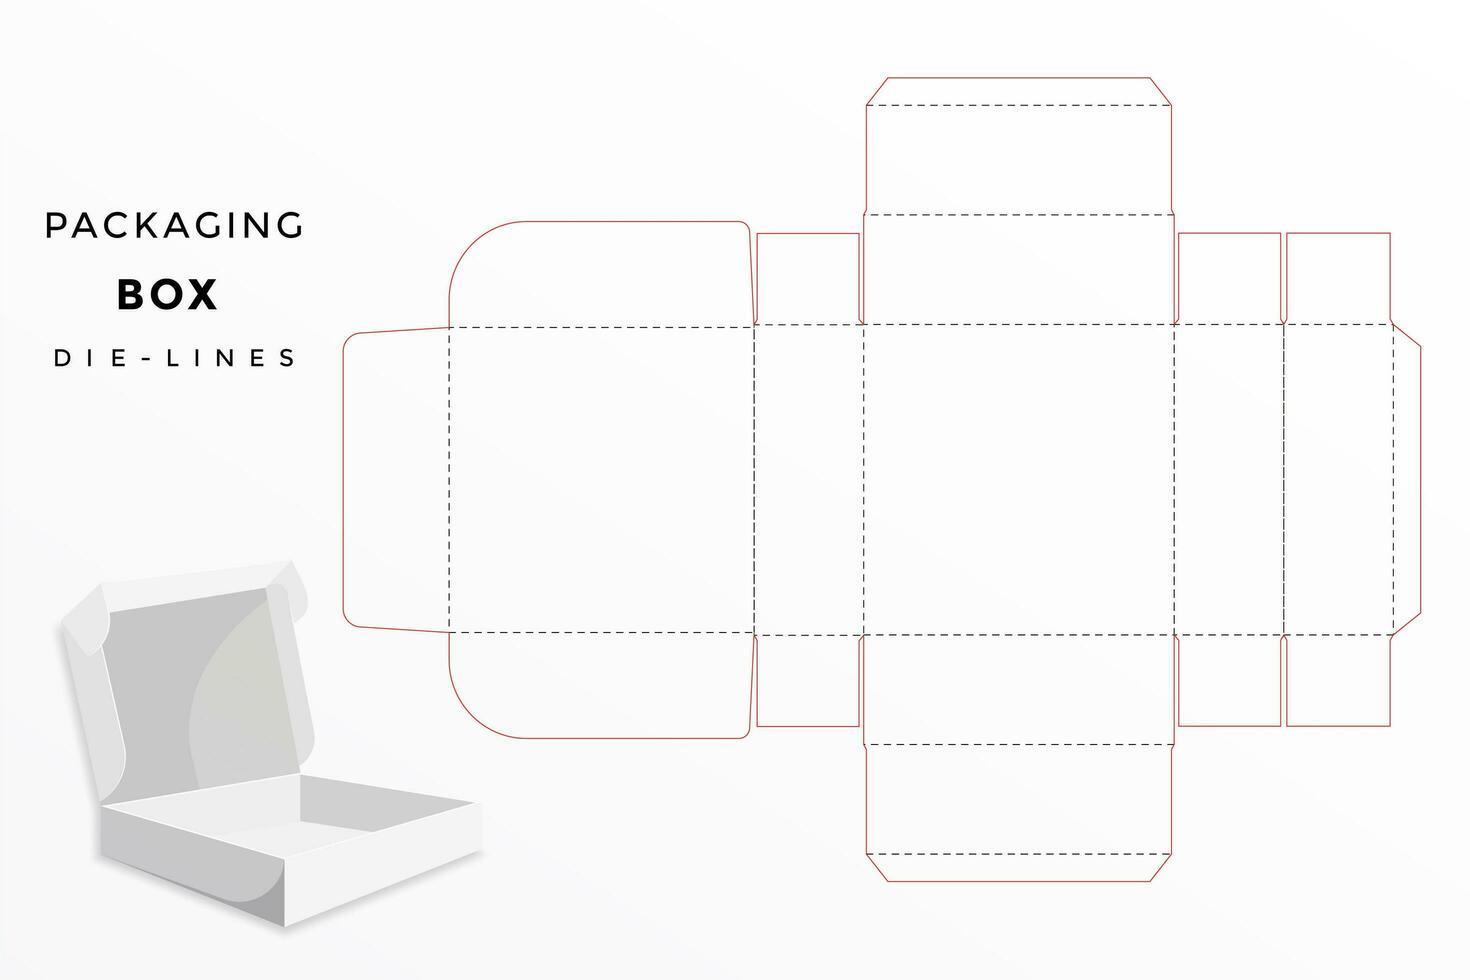 Modelo de corte e vinco de embalagens de caixa vetor